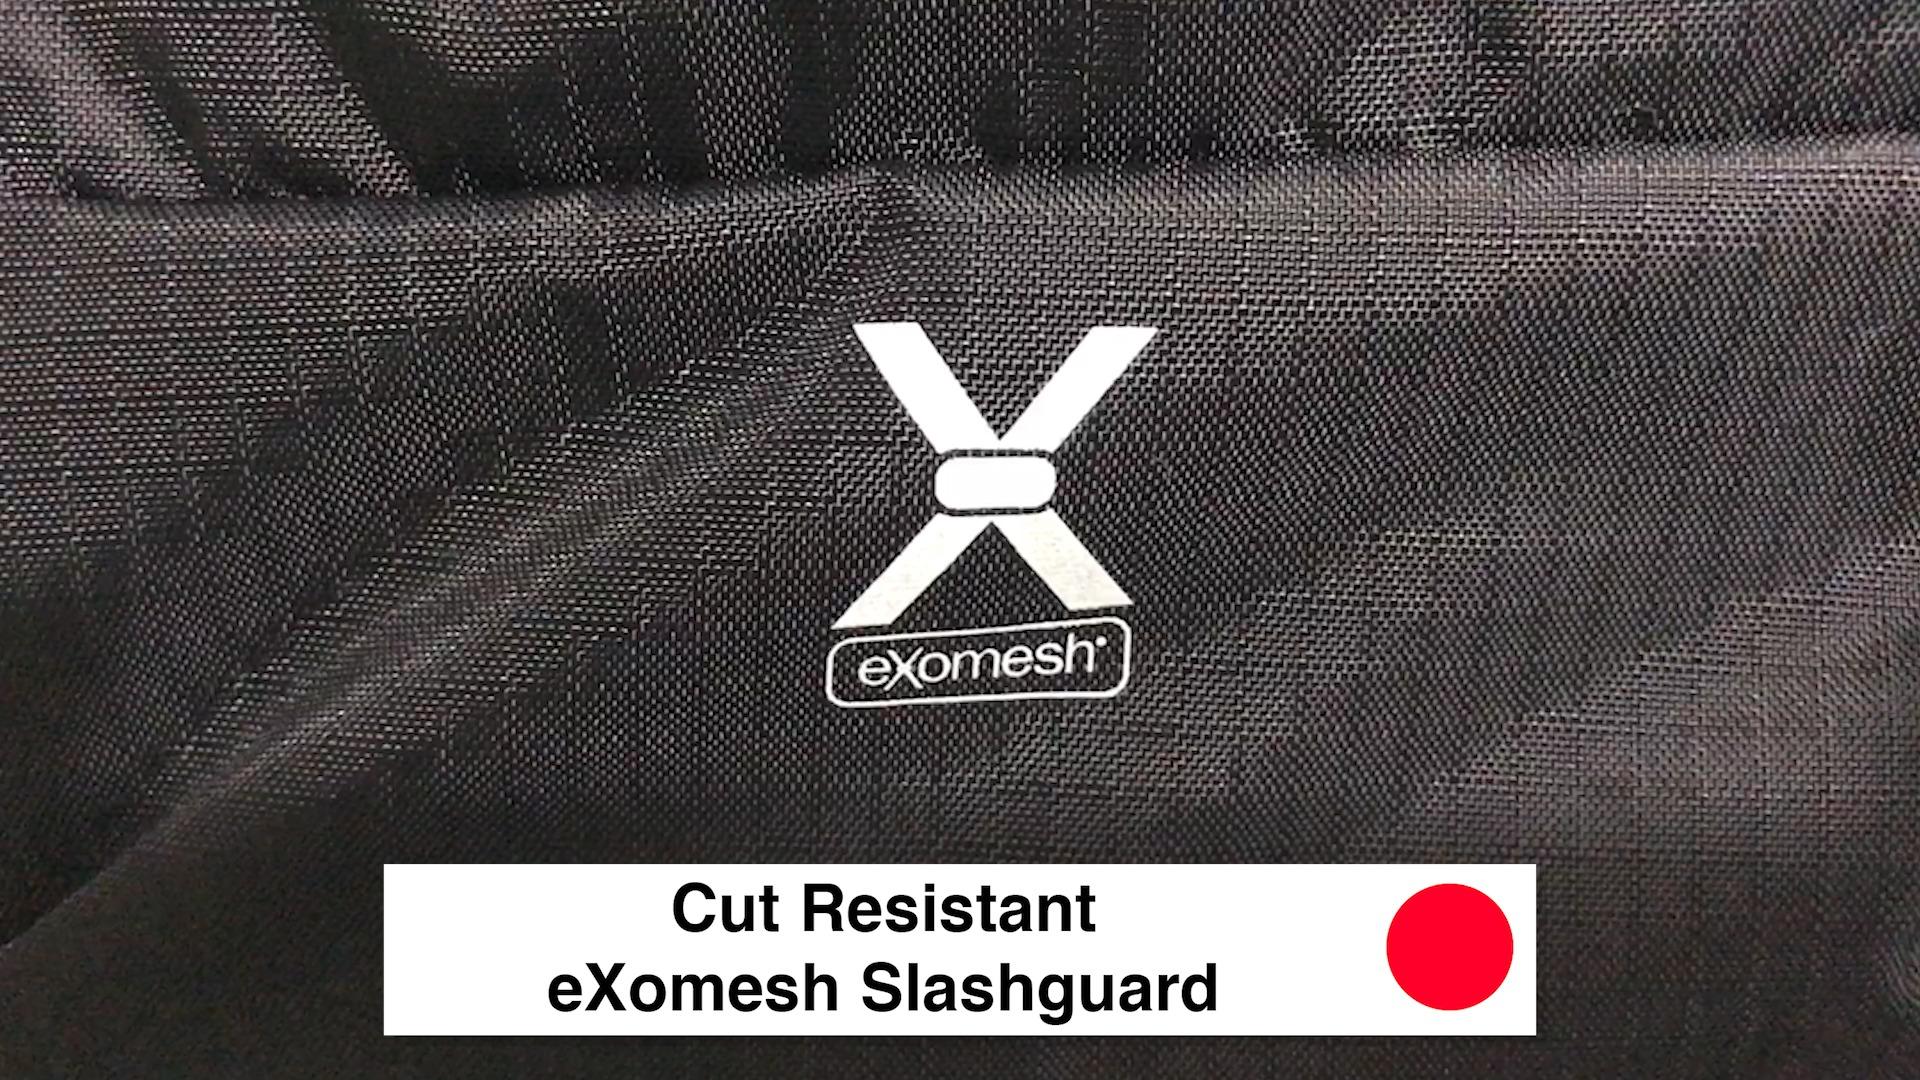 Cut Resistant eXomesh Slashguard - Pacsafe Venturesafe X30 Travel Pack - Black Anti Theft Backpack